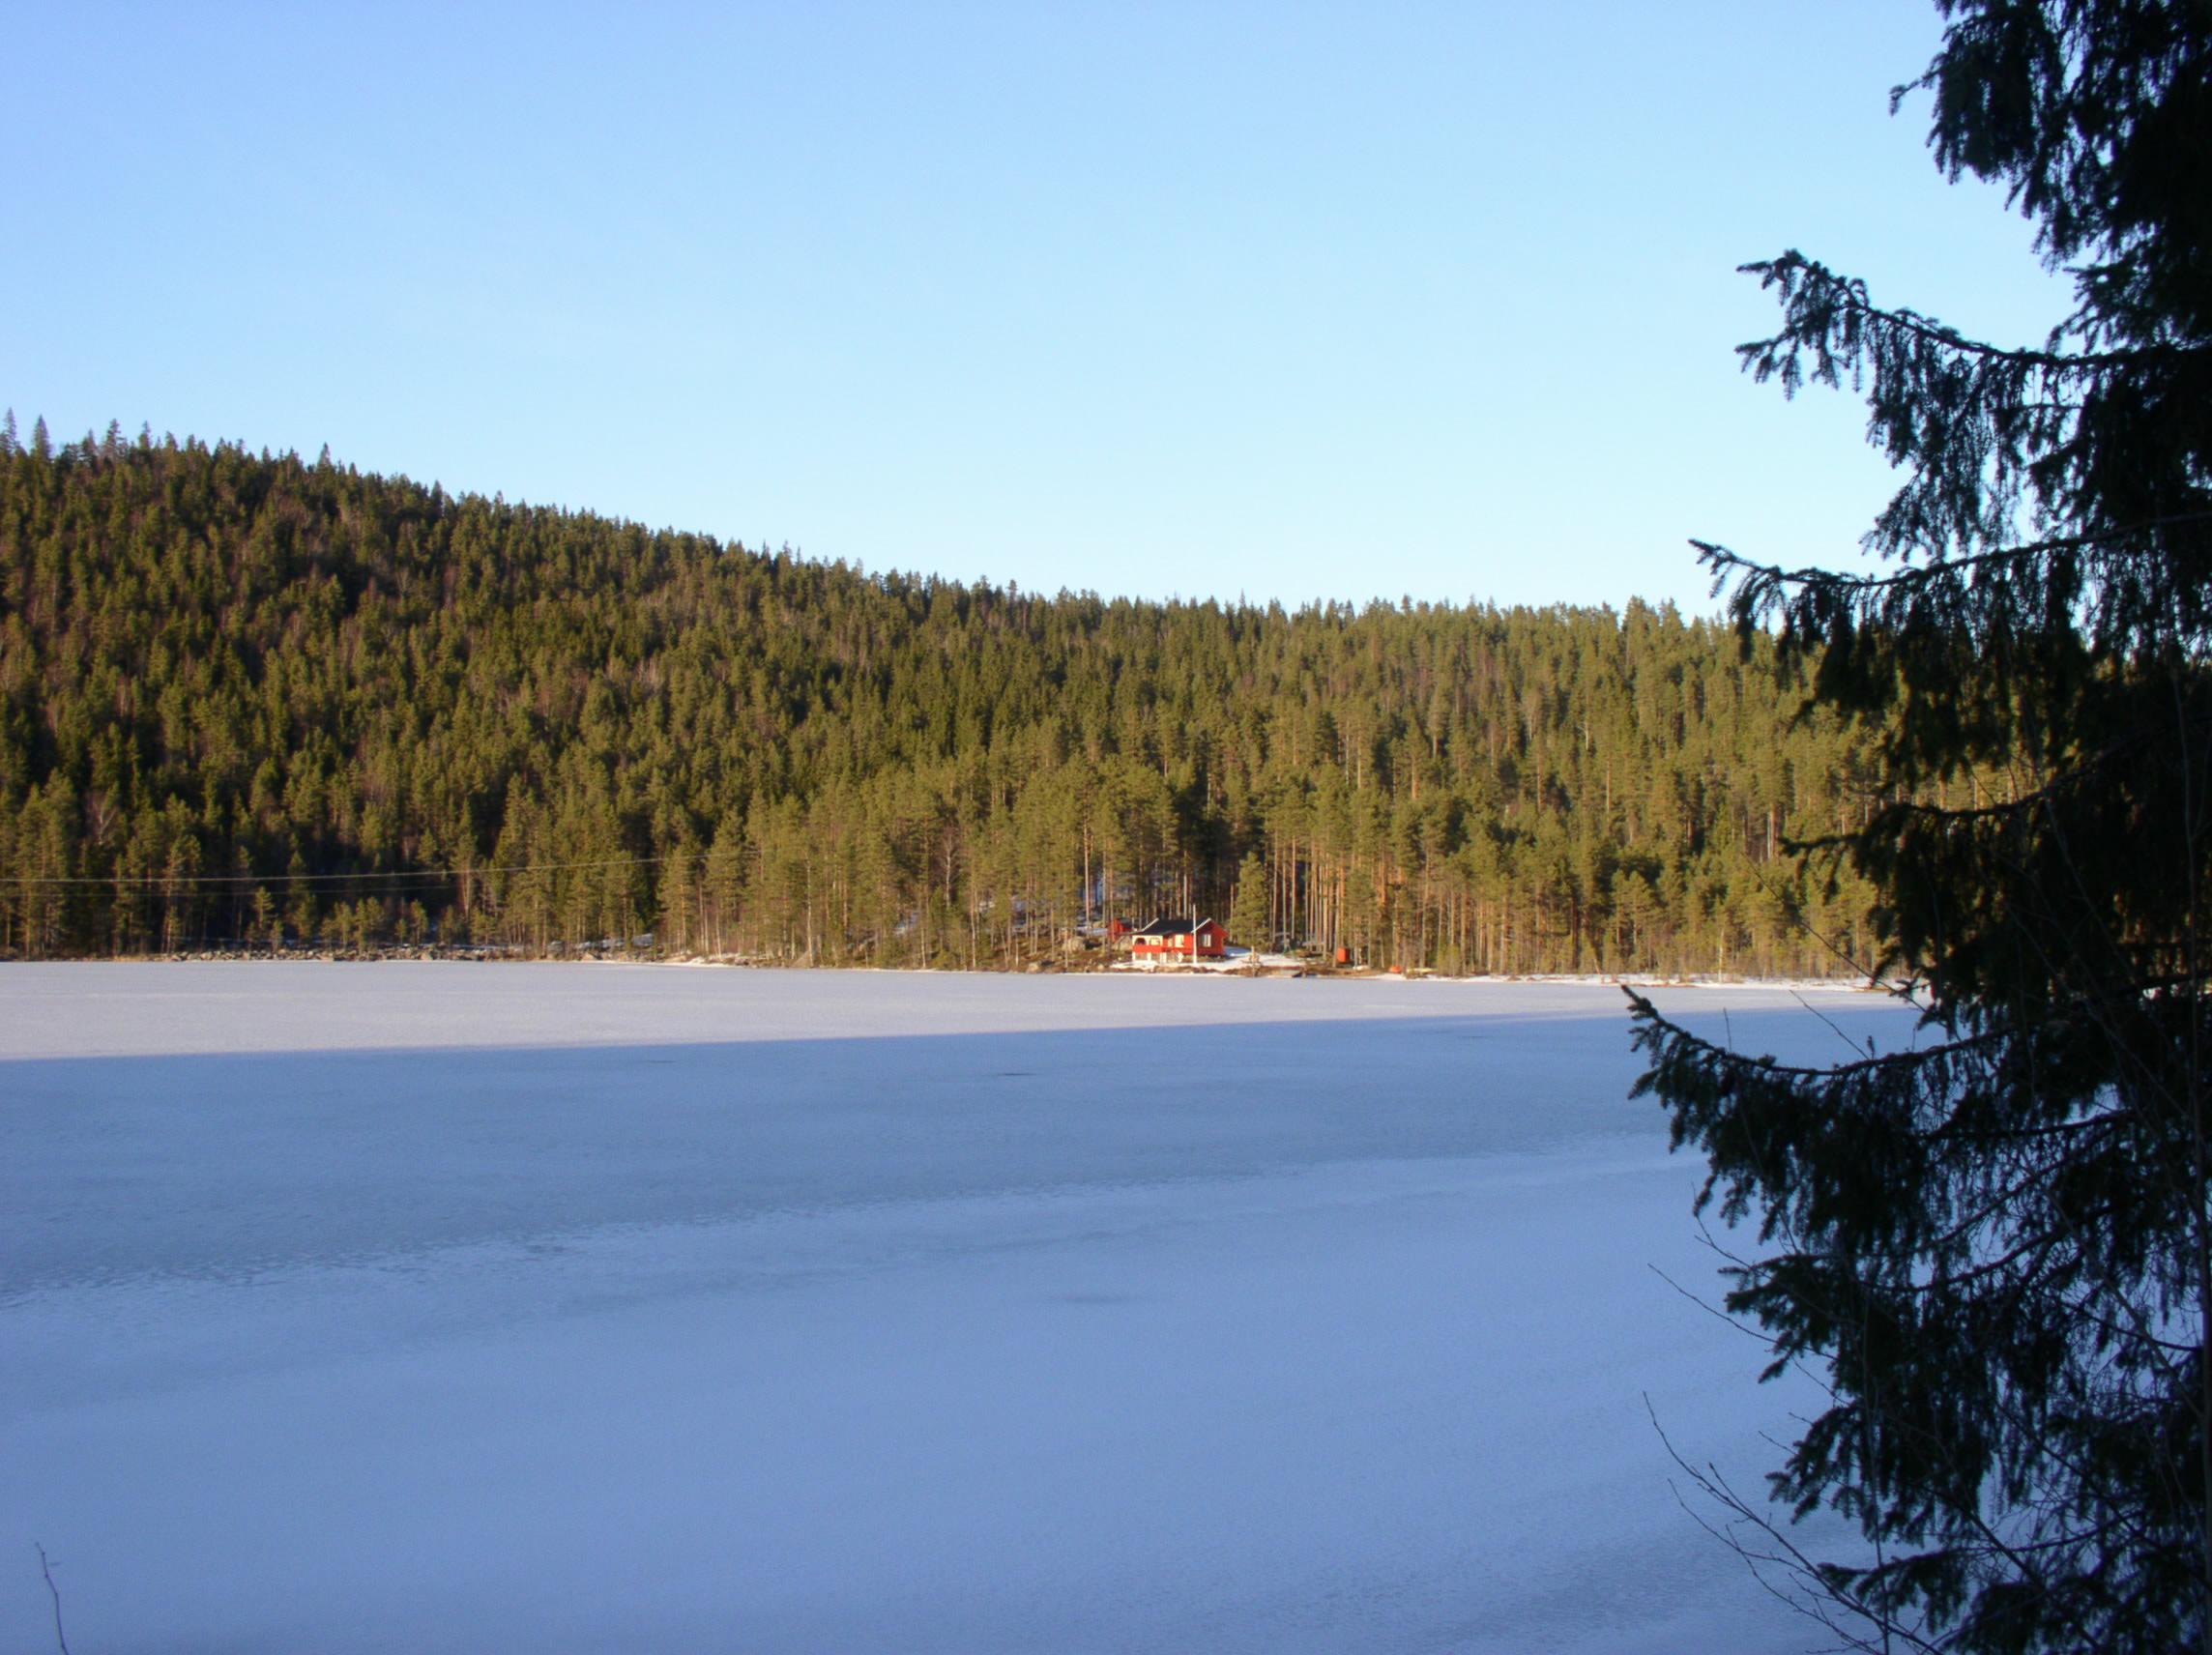 Svensk skovsø i nåletræsdomineret landskab